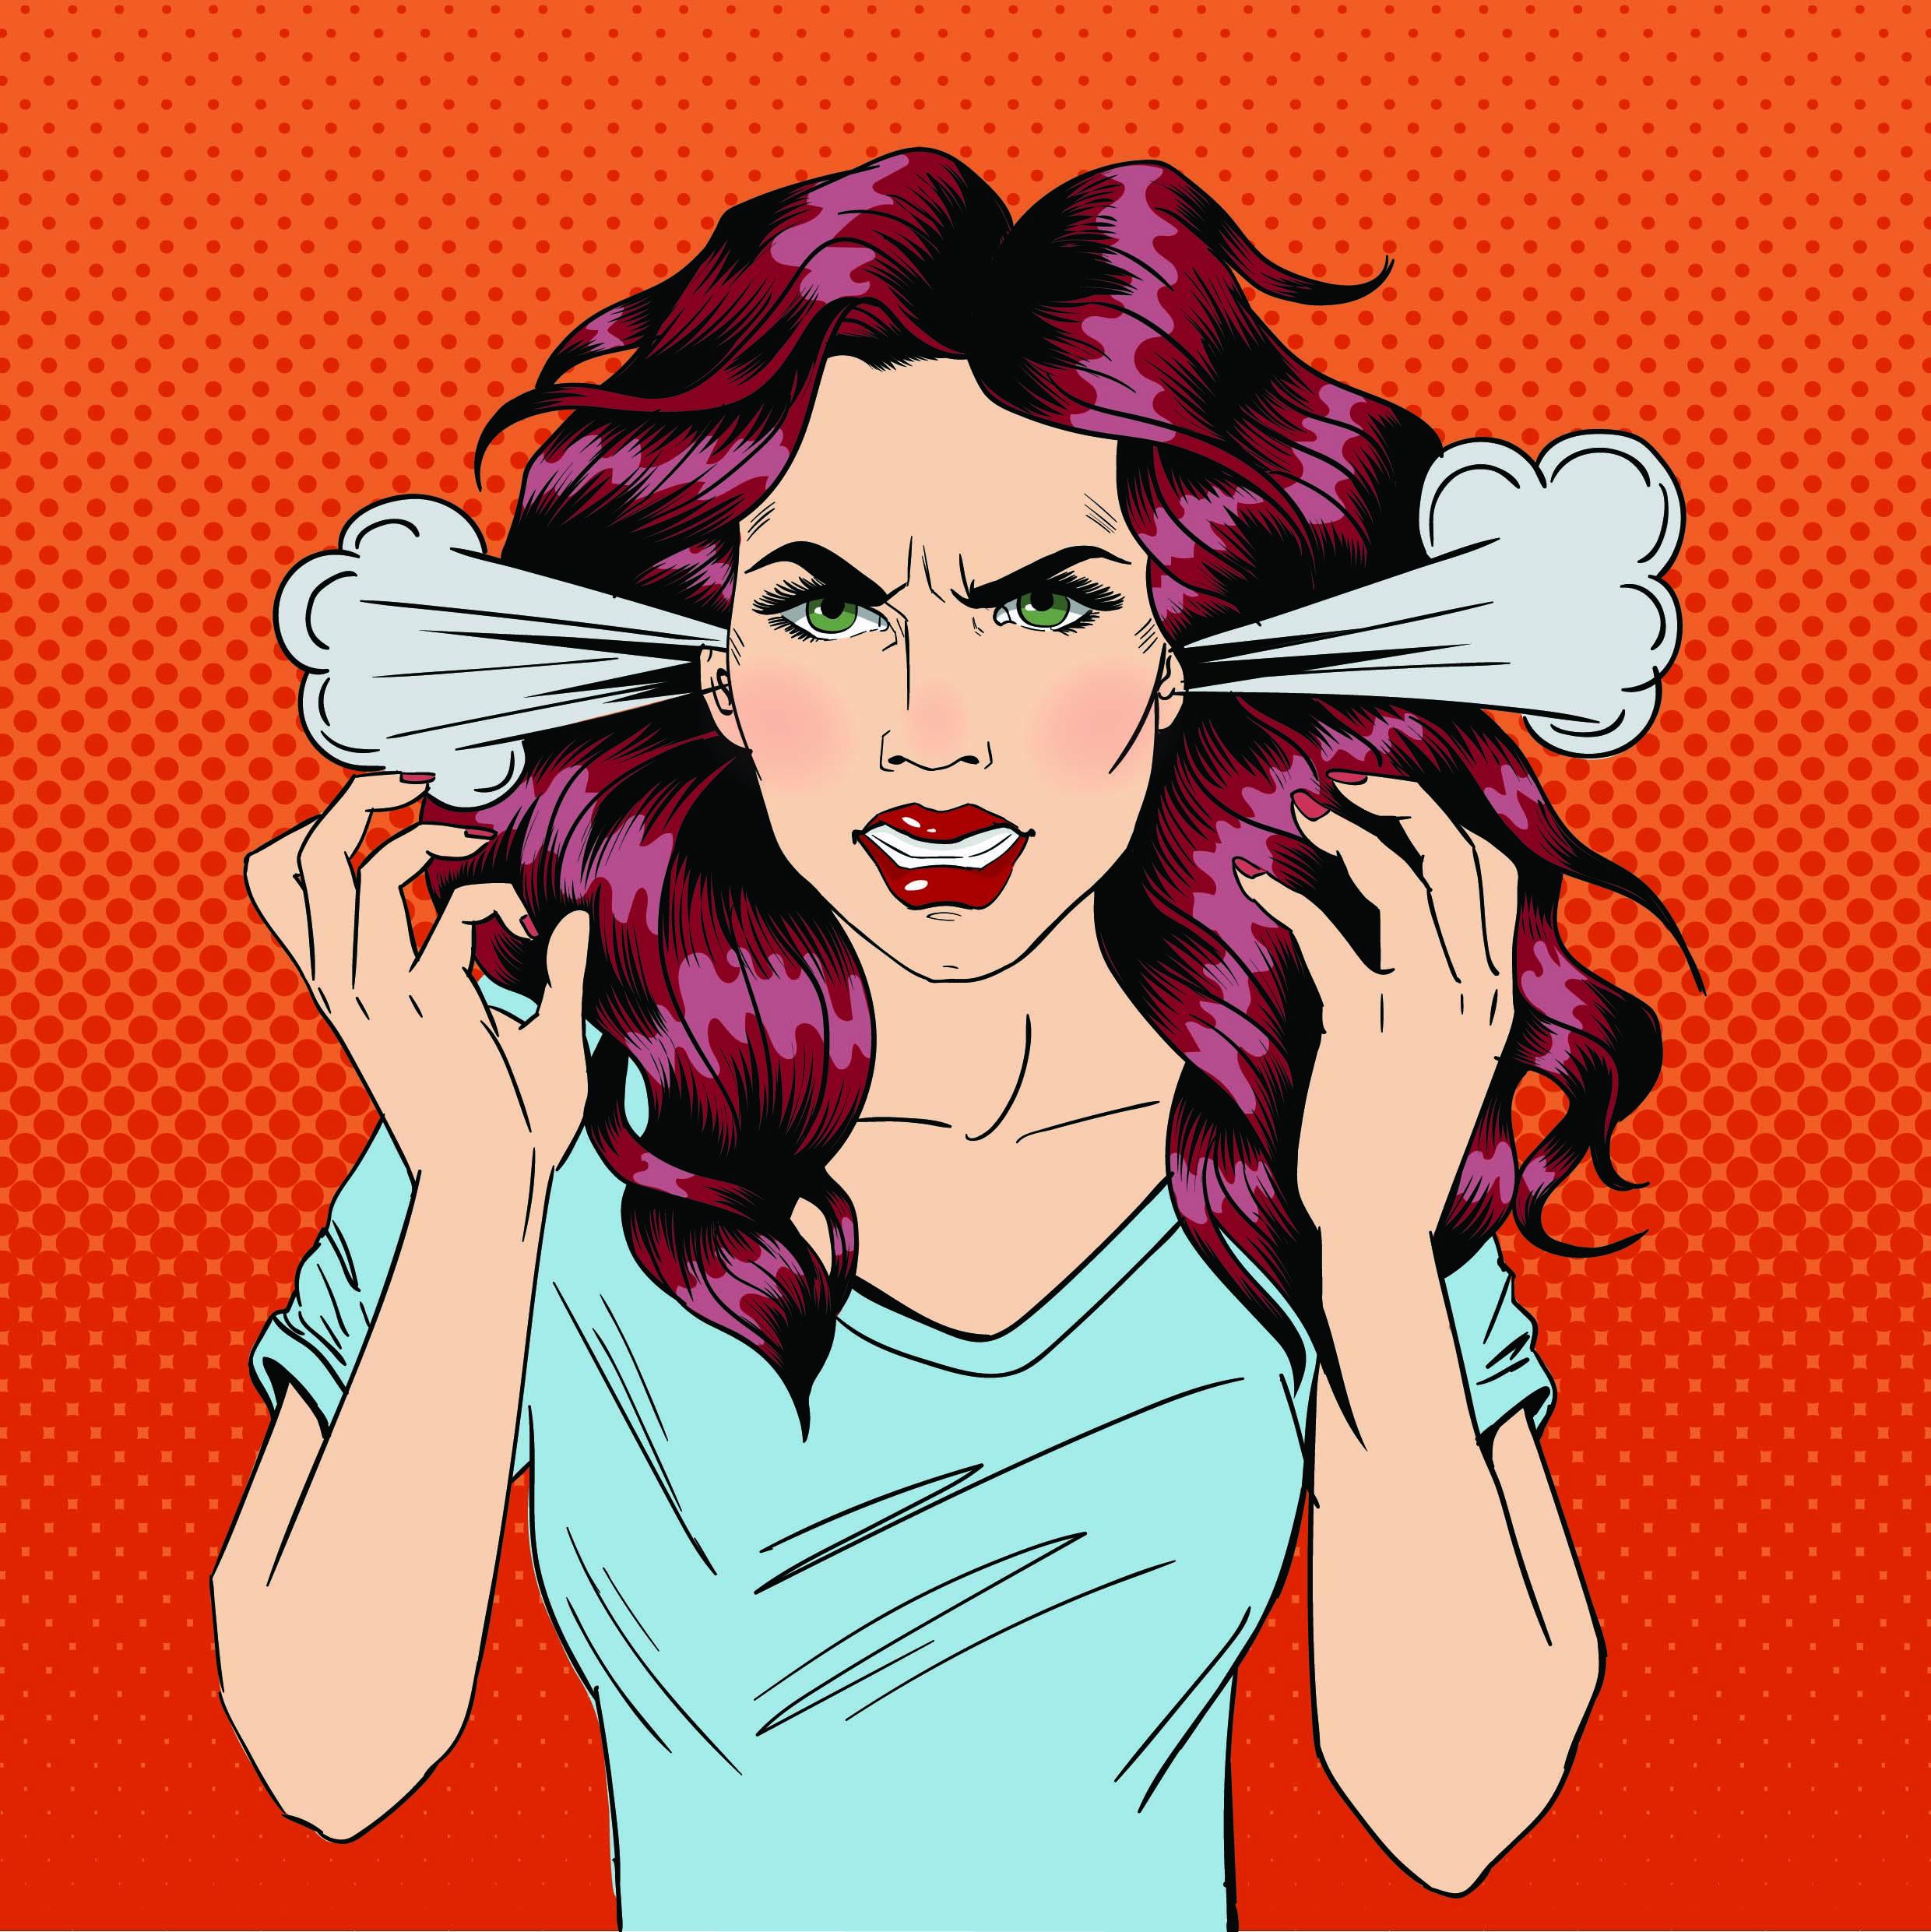 Angry Woman. Furious Girl. Negative Emotions. Bad Days. Bad Mood